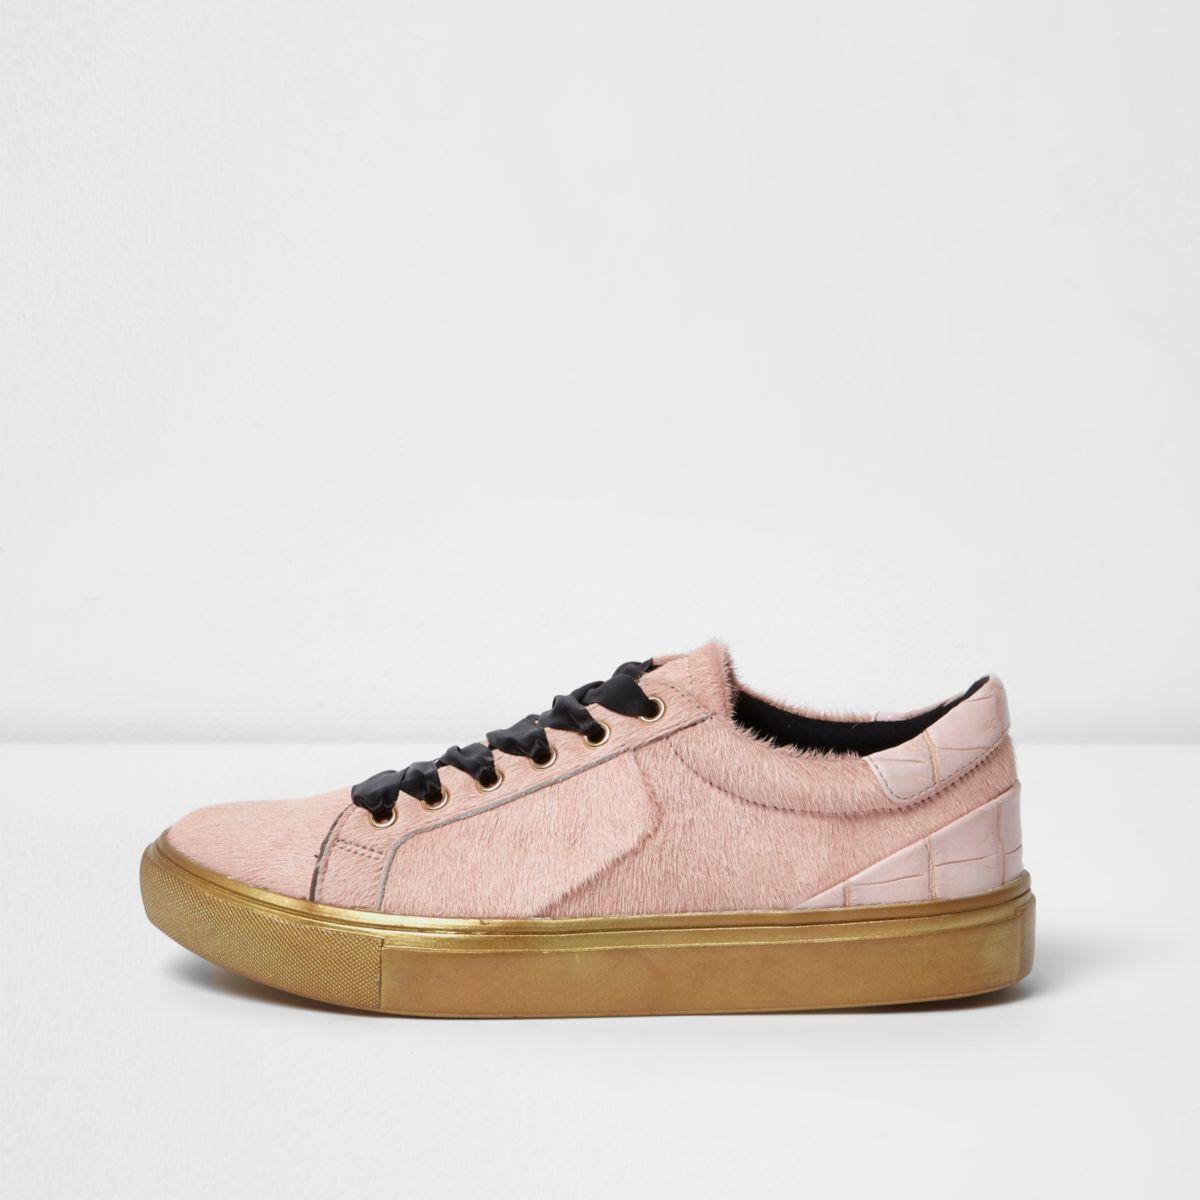 Light pink pony hair platform sneakers